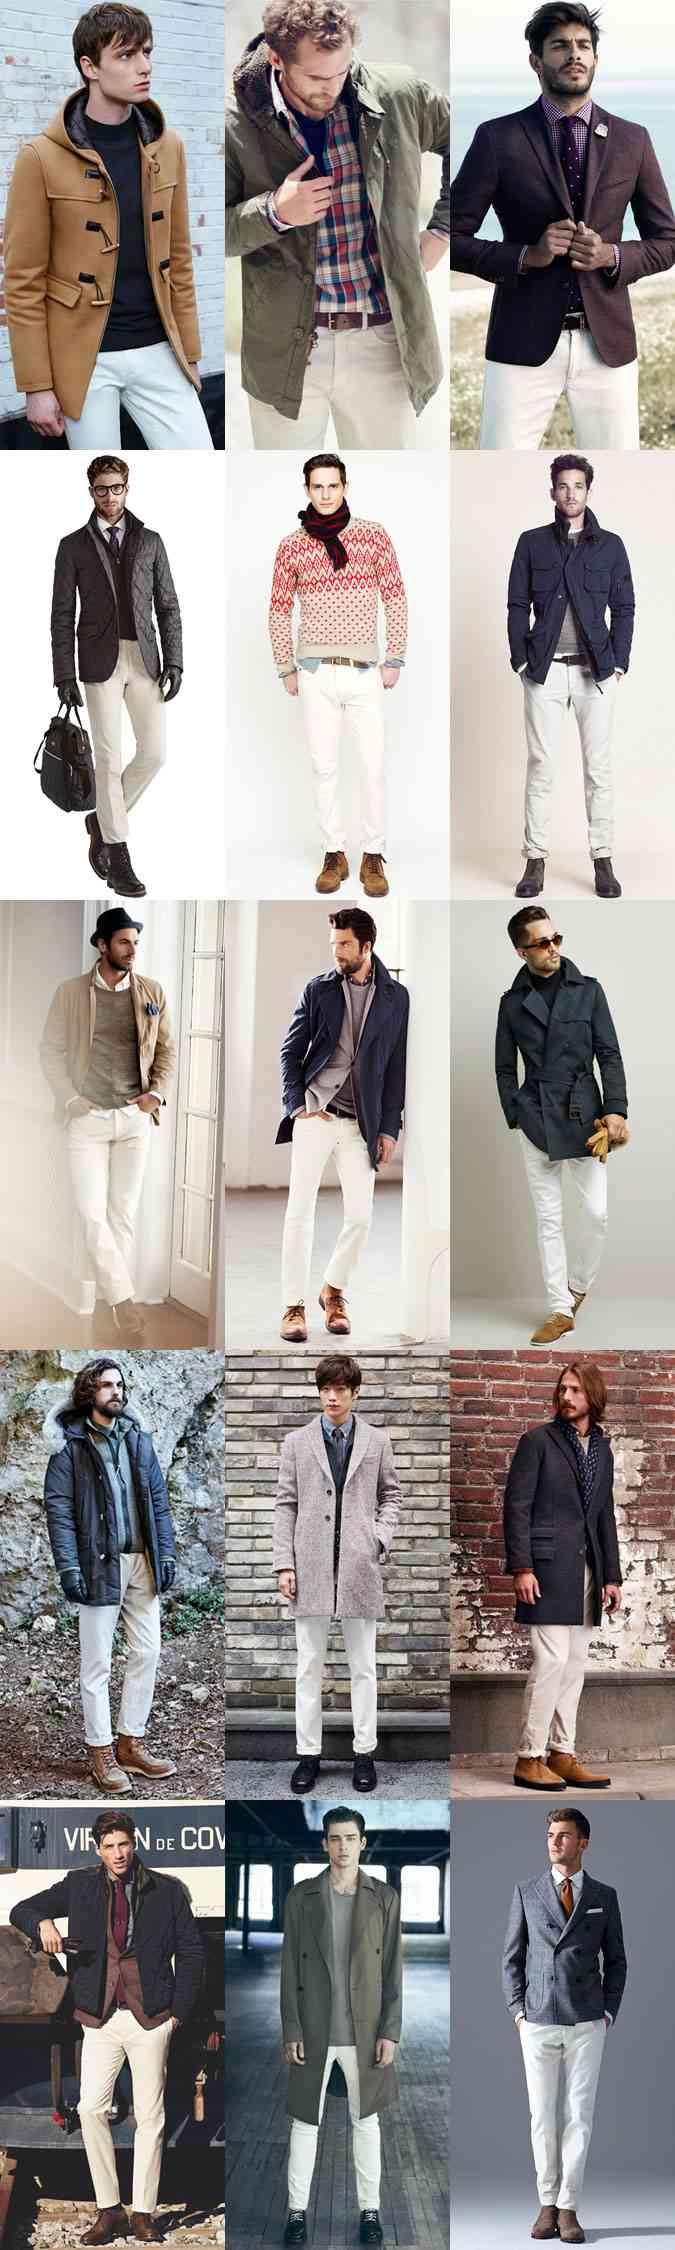 blugii albi la moda iarna